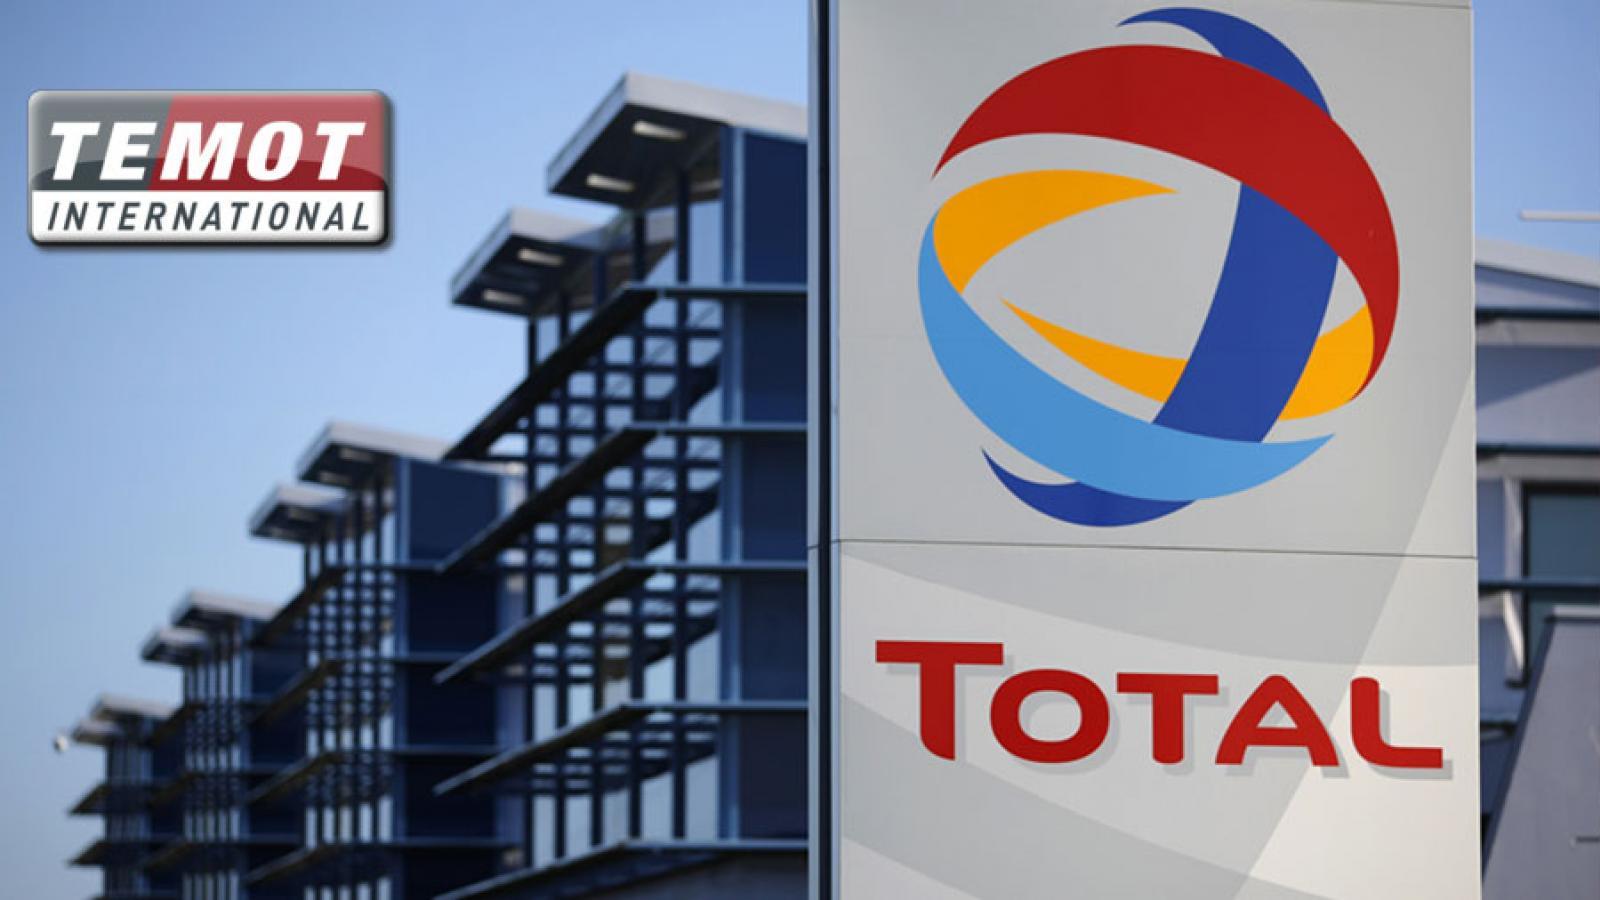 Partenariat Total lubrifiant et Temot international